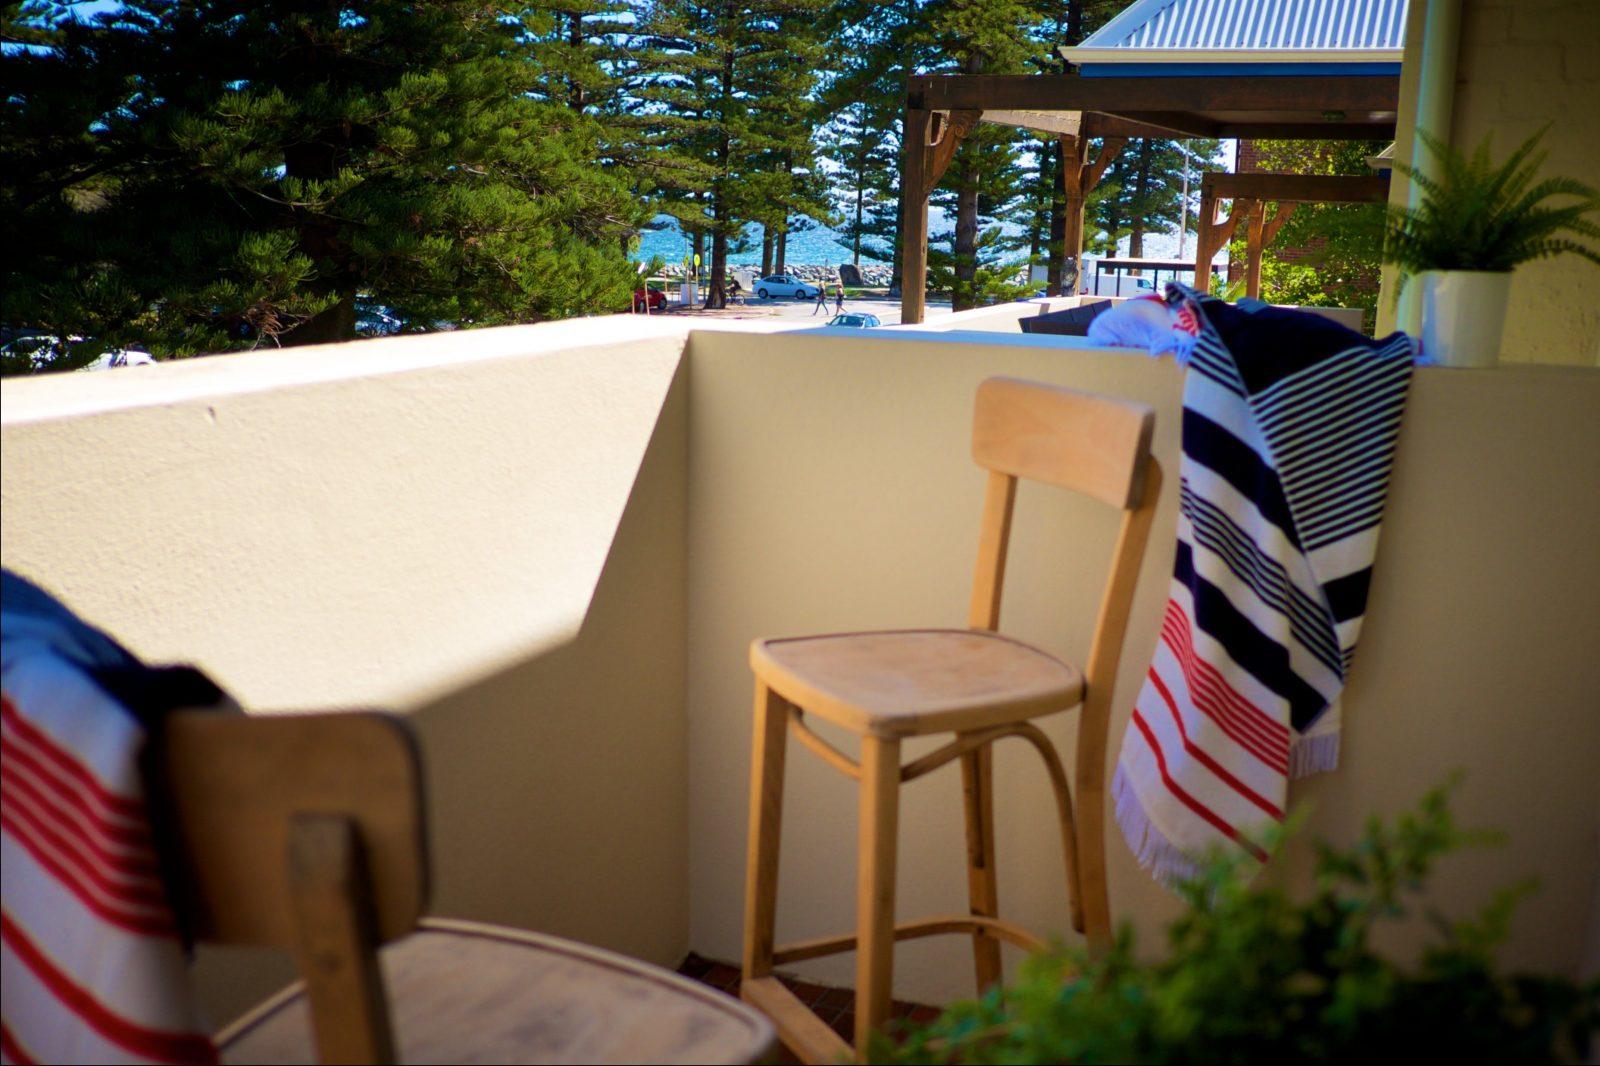 Cottesloe Artist's Beach Retreat, Cottesloe, Western Australia